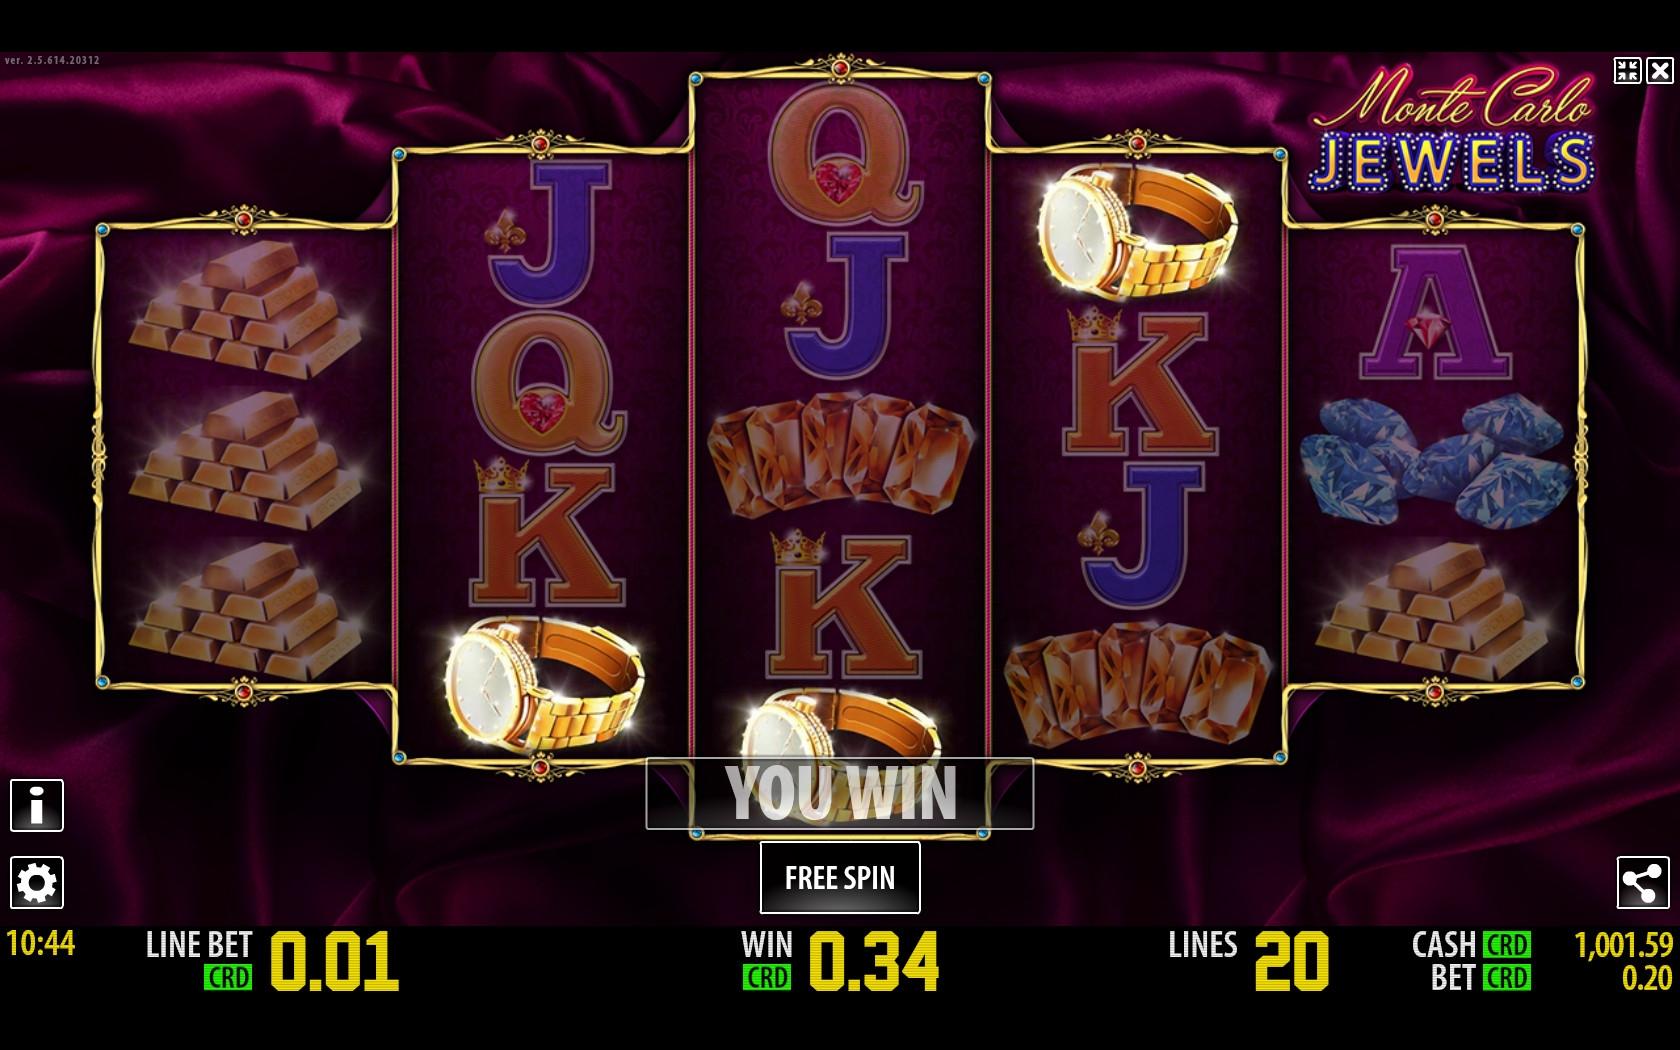 Monte Carlo Jewels Slot Machine